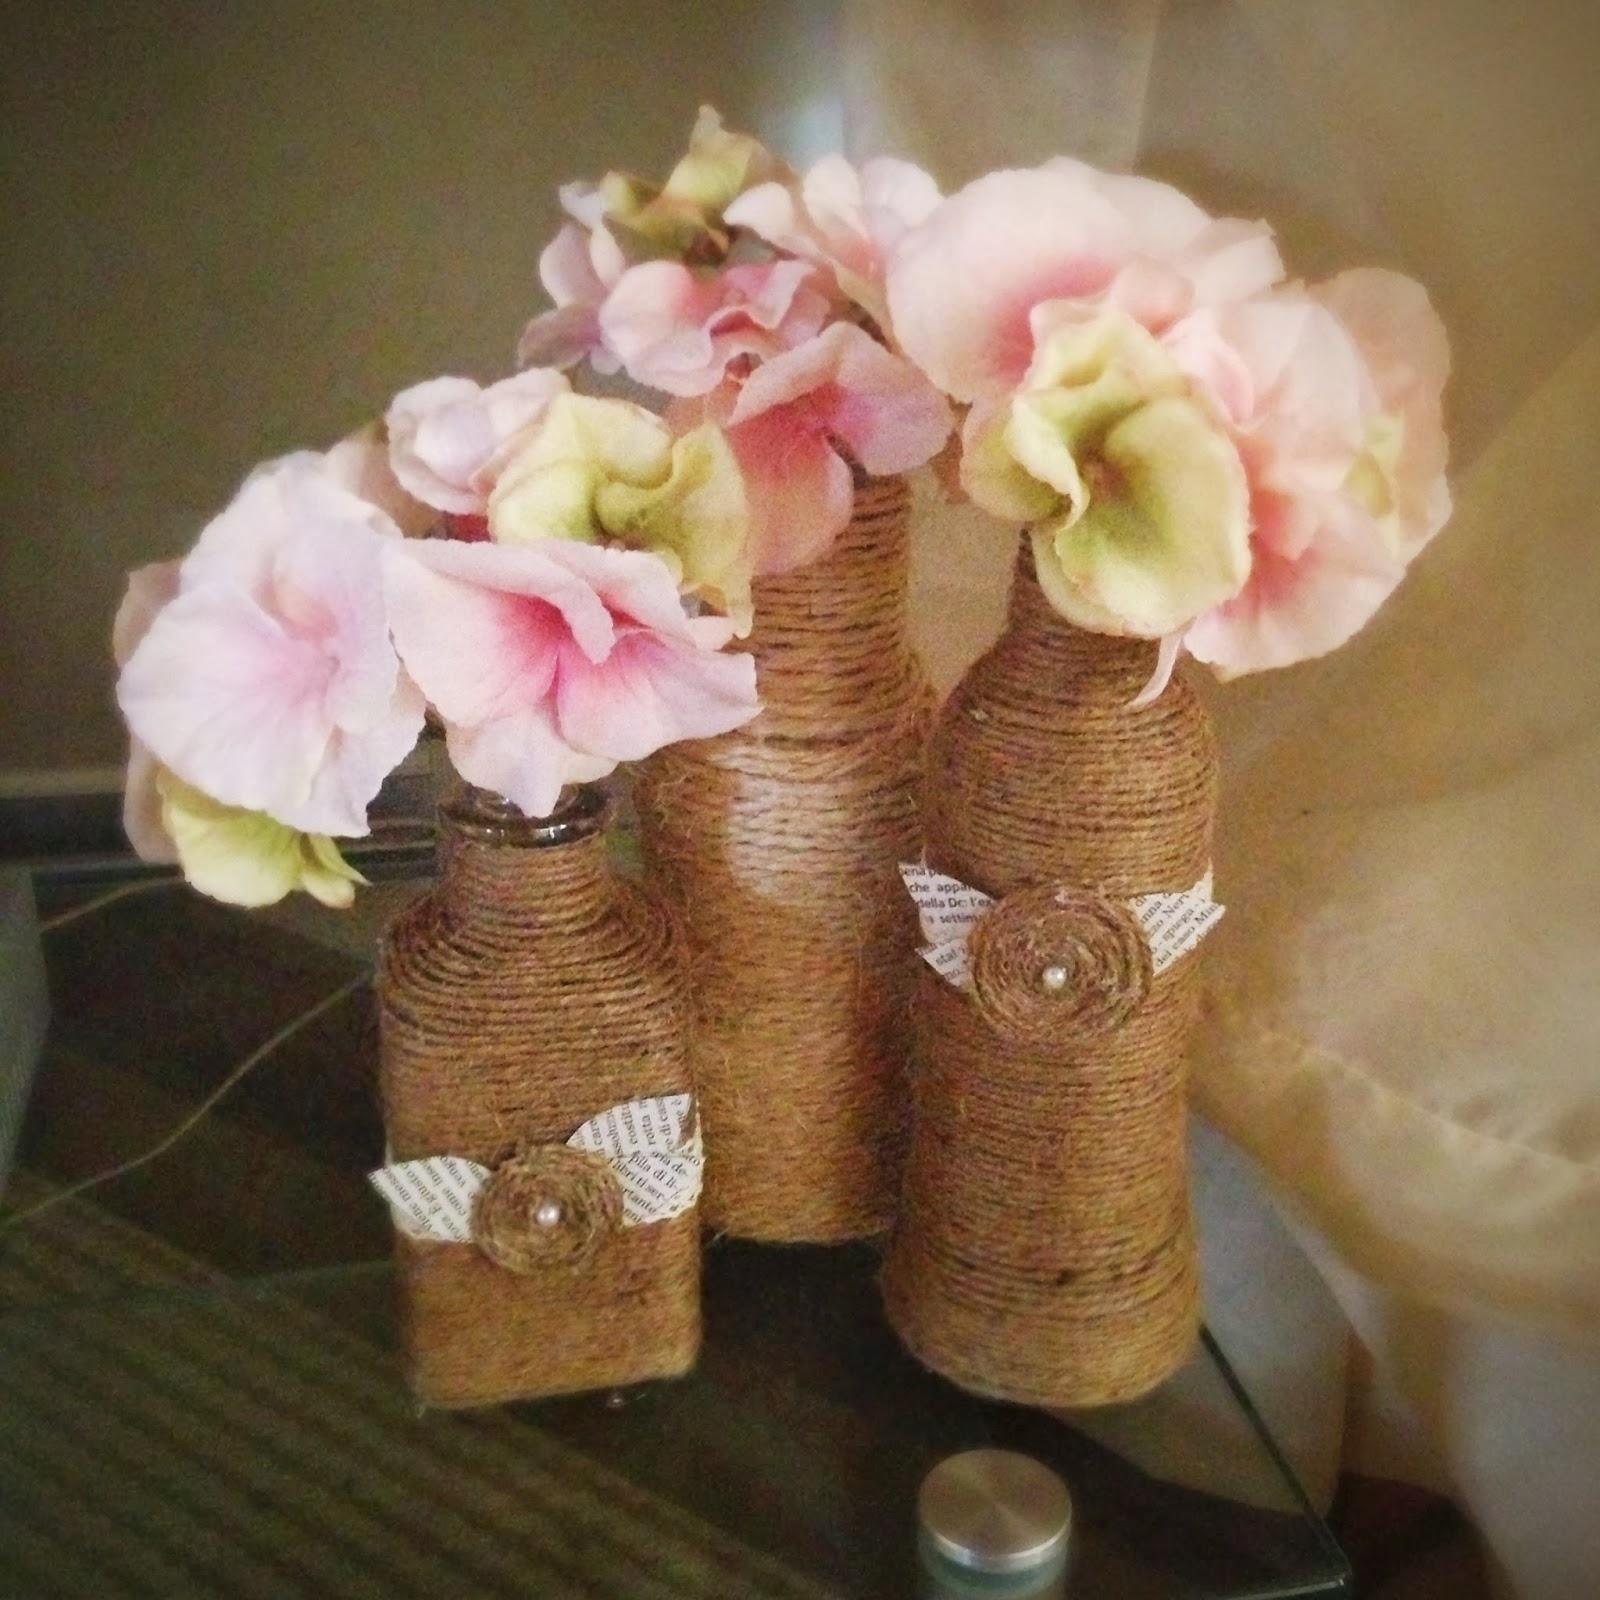 Giugizu 39 s corner d i y yarn wrapped bottles bottiglie - Bottiglie vetro decorate ...